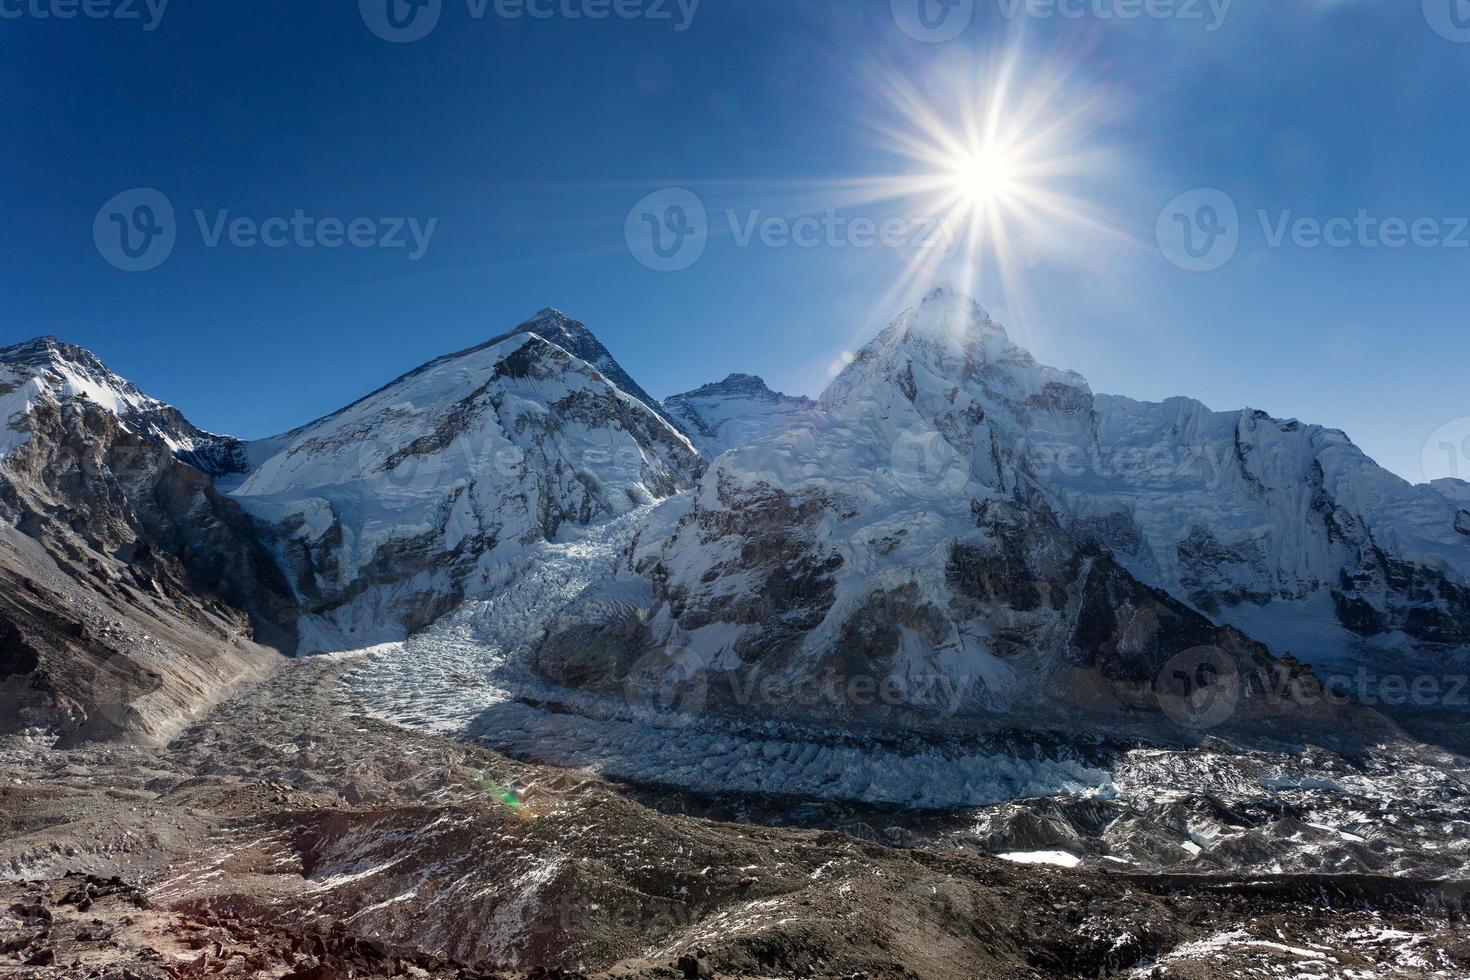 Morning sun above Mount Everest, lhotse and Nuptse photo